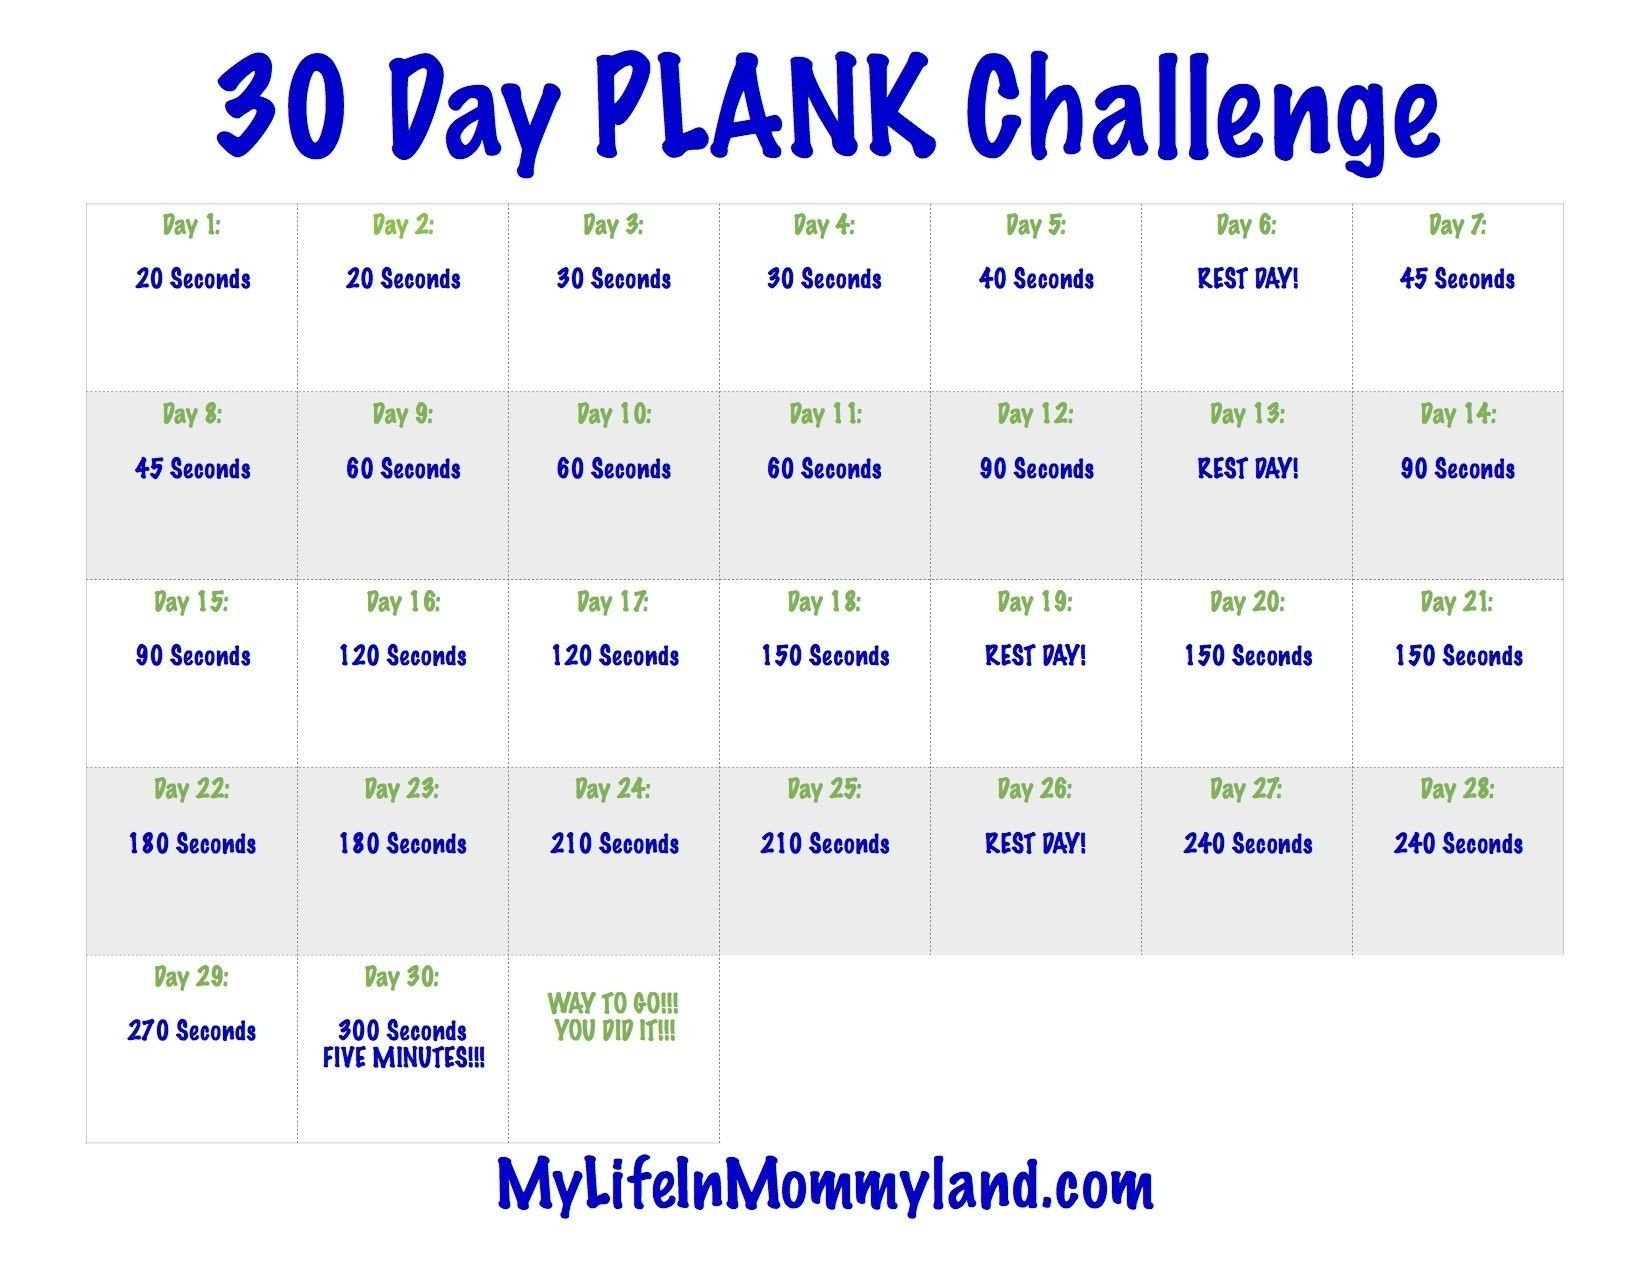 The 30 Day Plank Challenge Calendar | Get Your Calendar